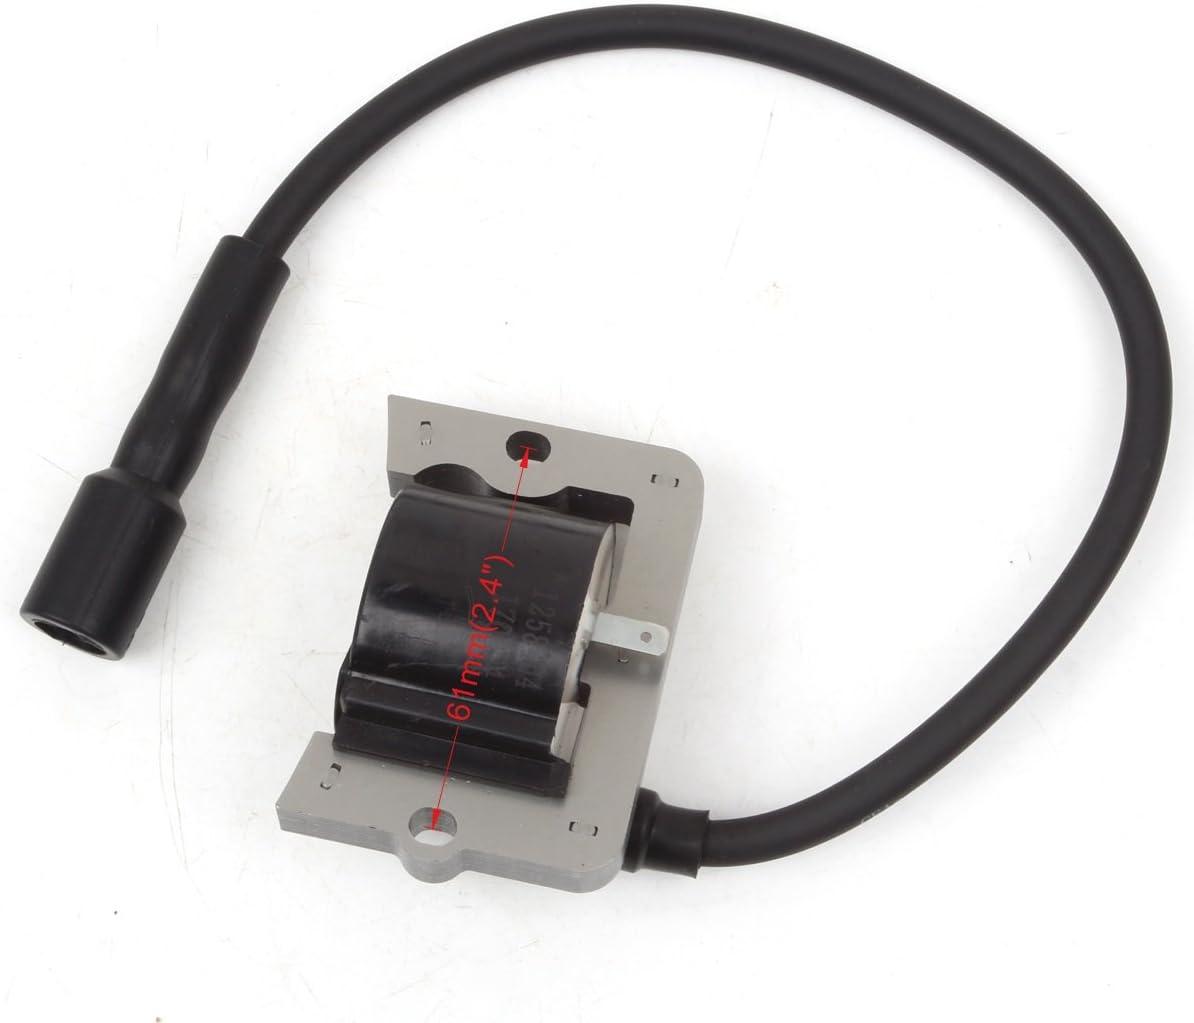 Wingsmoto Ignition Coil for Kohler Lawn /& Garden Equipment Engine CH11 CH13 CH15 CV13 CV15 12-584-04-S 12-584-05-S